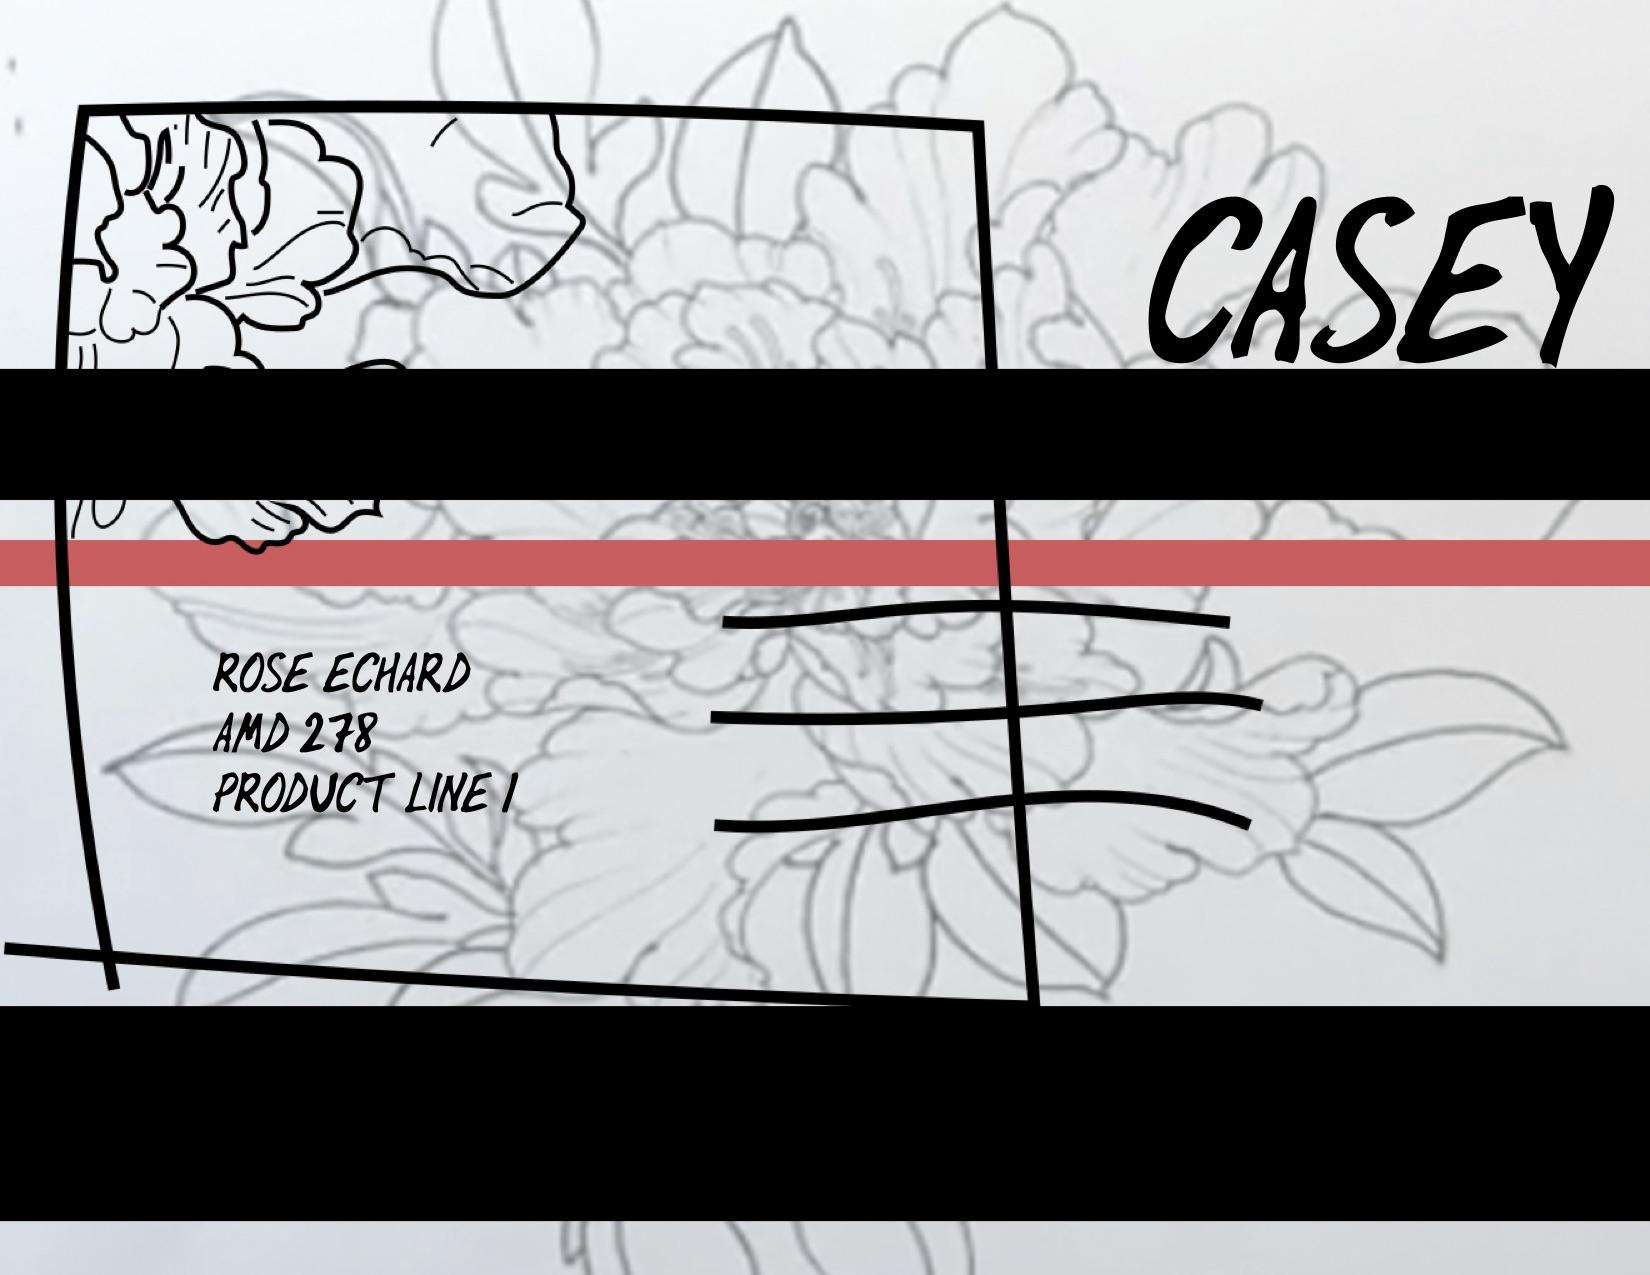 ROSE_ECHARD_DESIGN LINE_1 copy.jpg